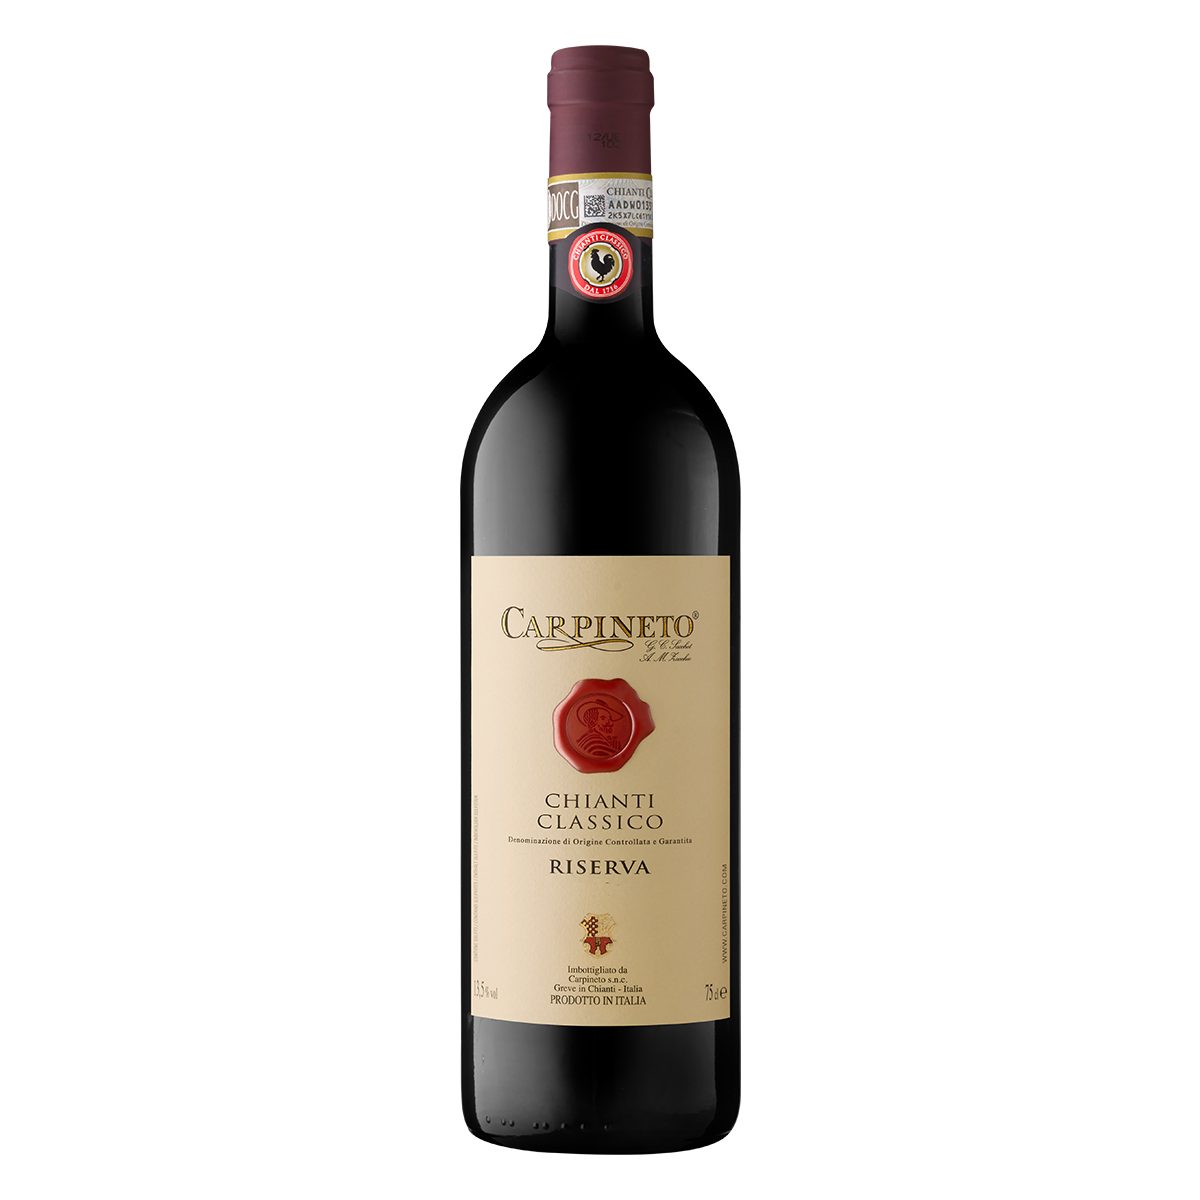 ITTC1207-15 義大利卡品耐托古典奇揚地2015特級陳年紅酒 Carpineto Chianti Classico D.O.C.G. Riserva